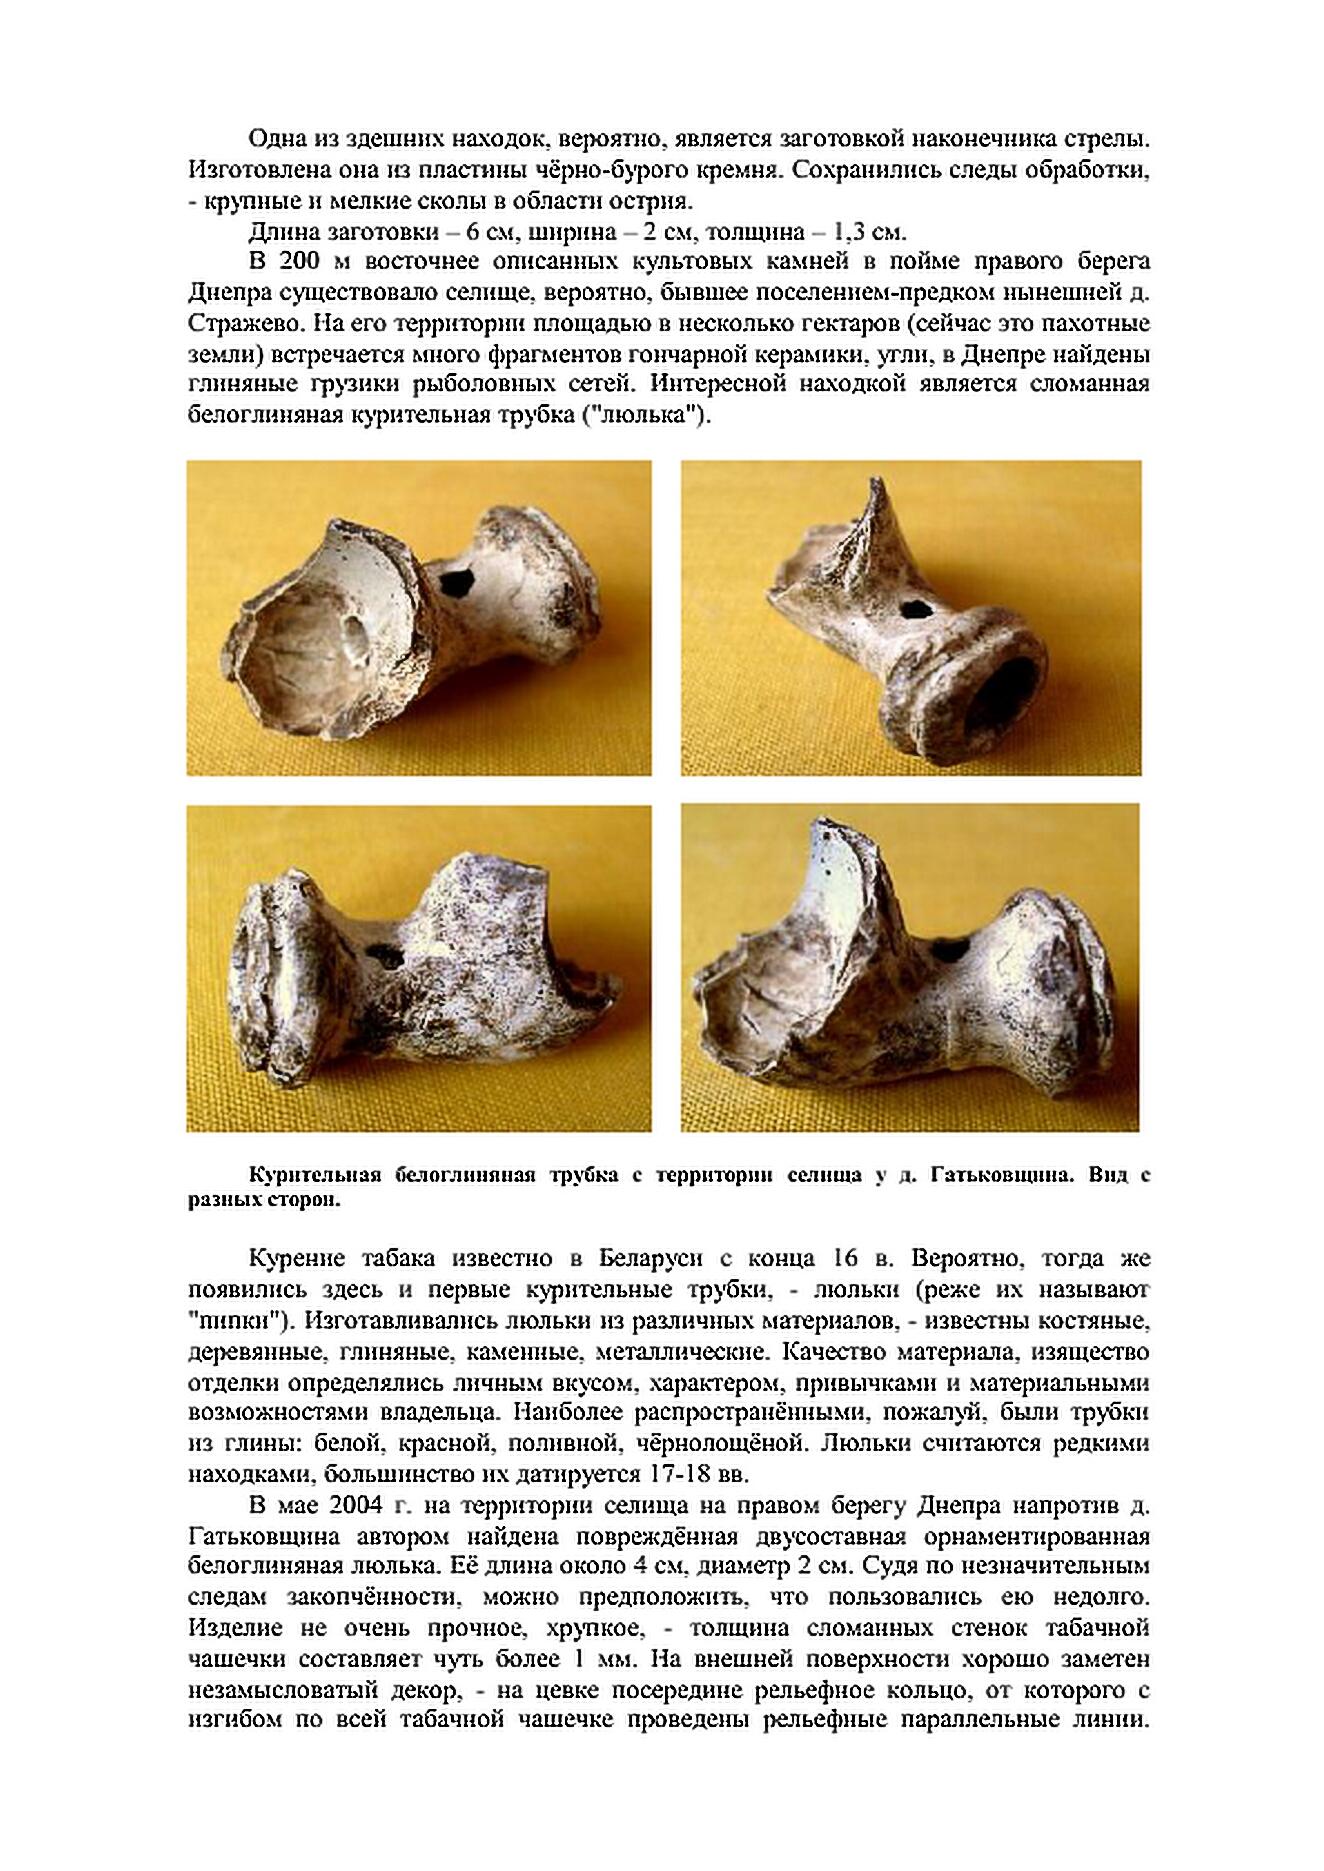 http://s5.uploads.ru/UxpnR.jpg